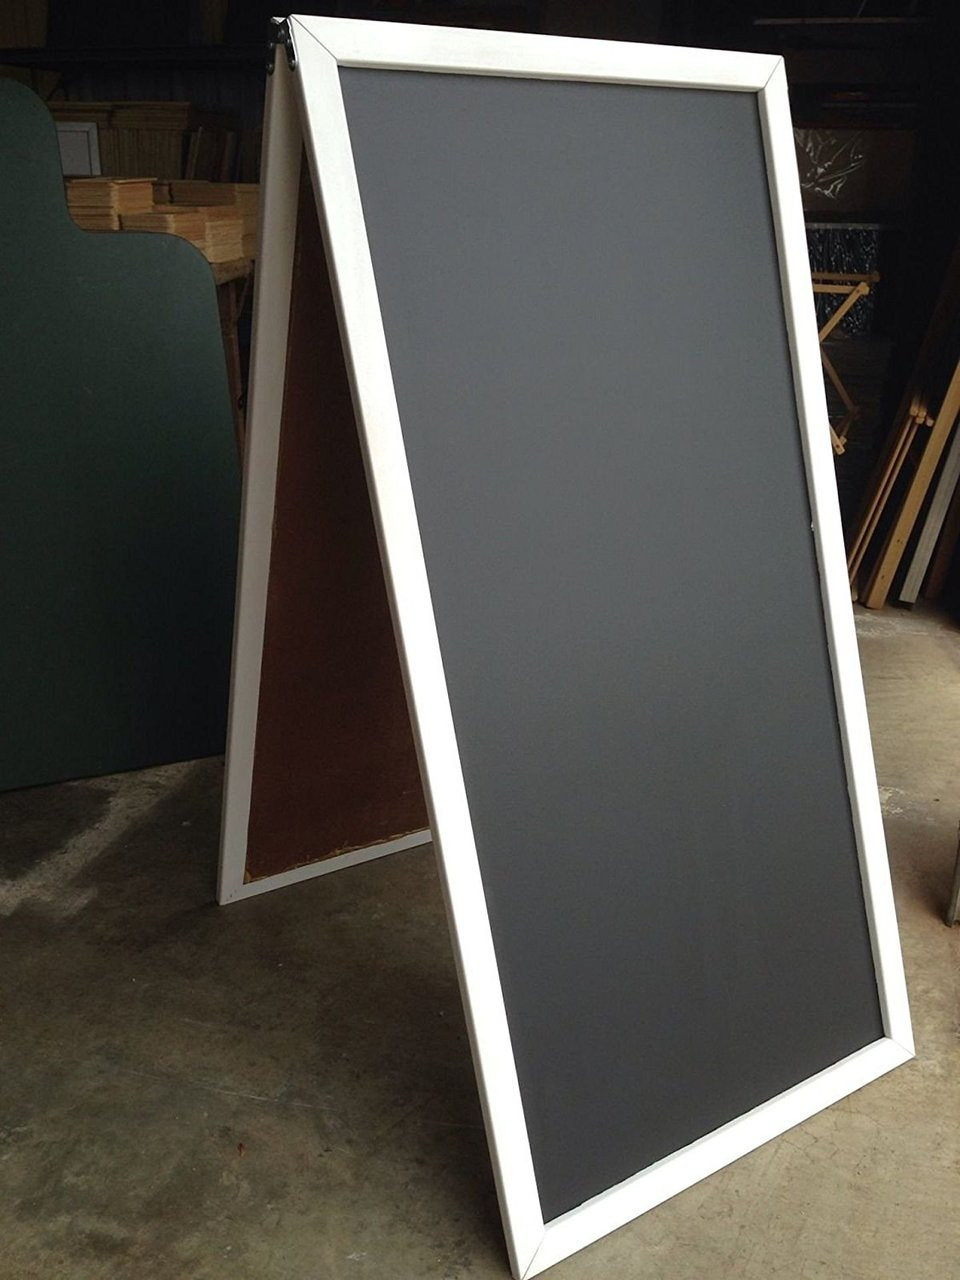 Sidewalk Sign 18 X 29 Black Chalkboard Display Easel Mahogany Frame